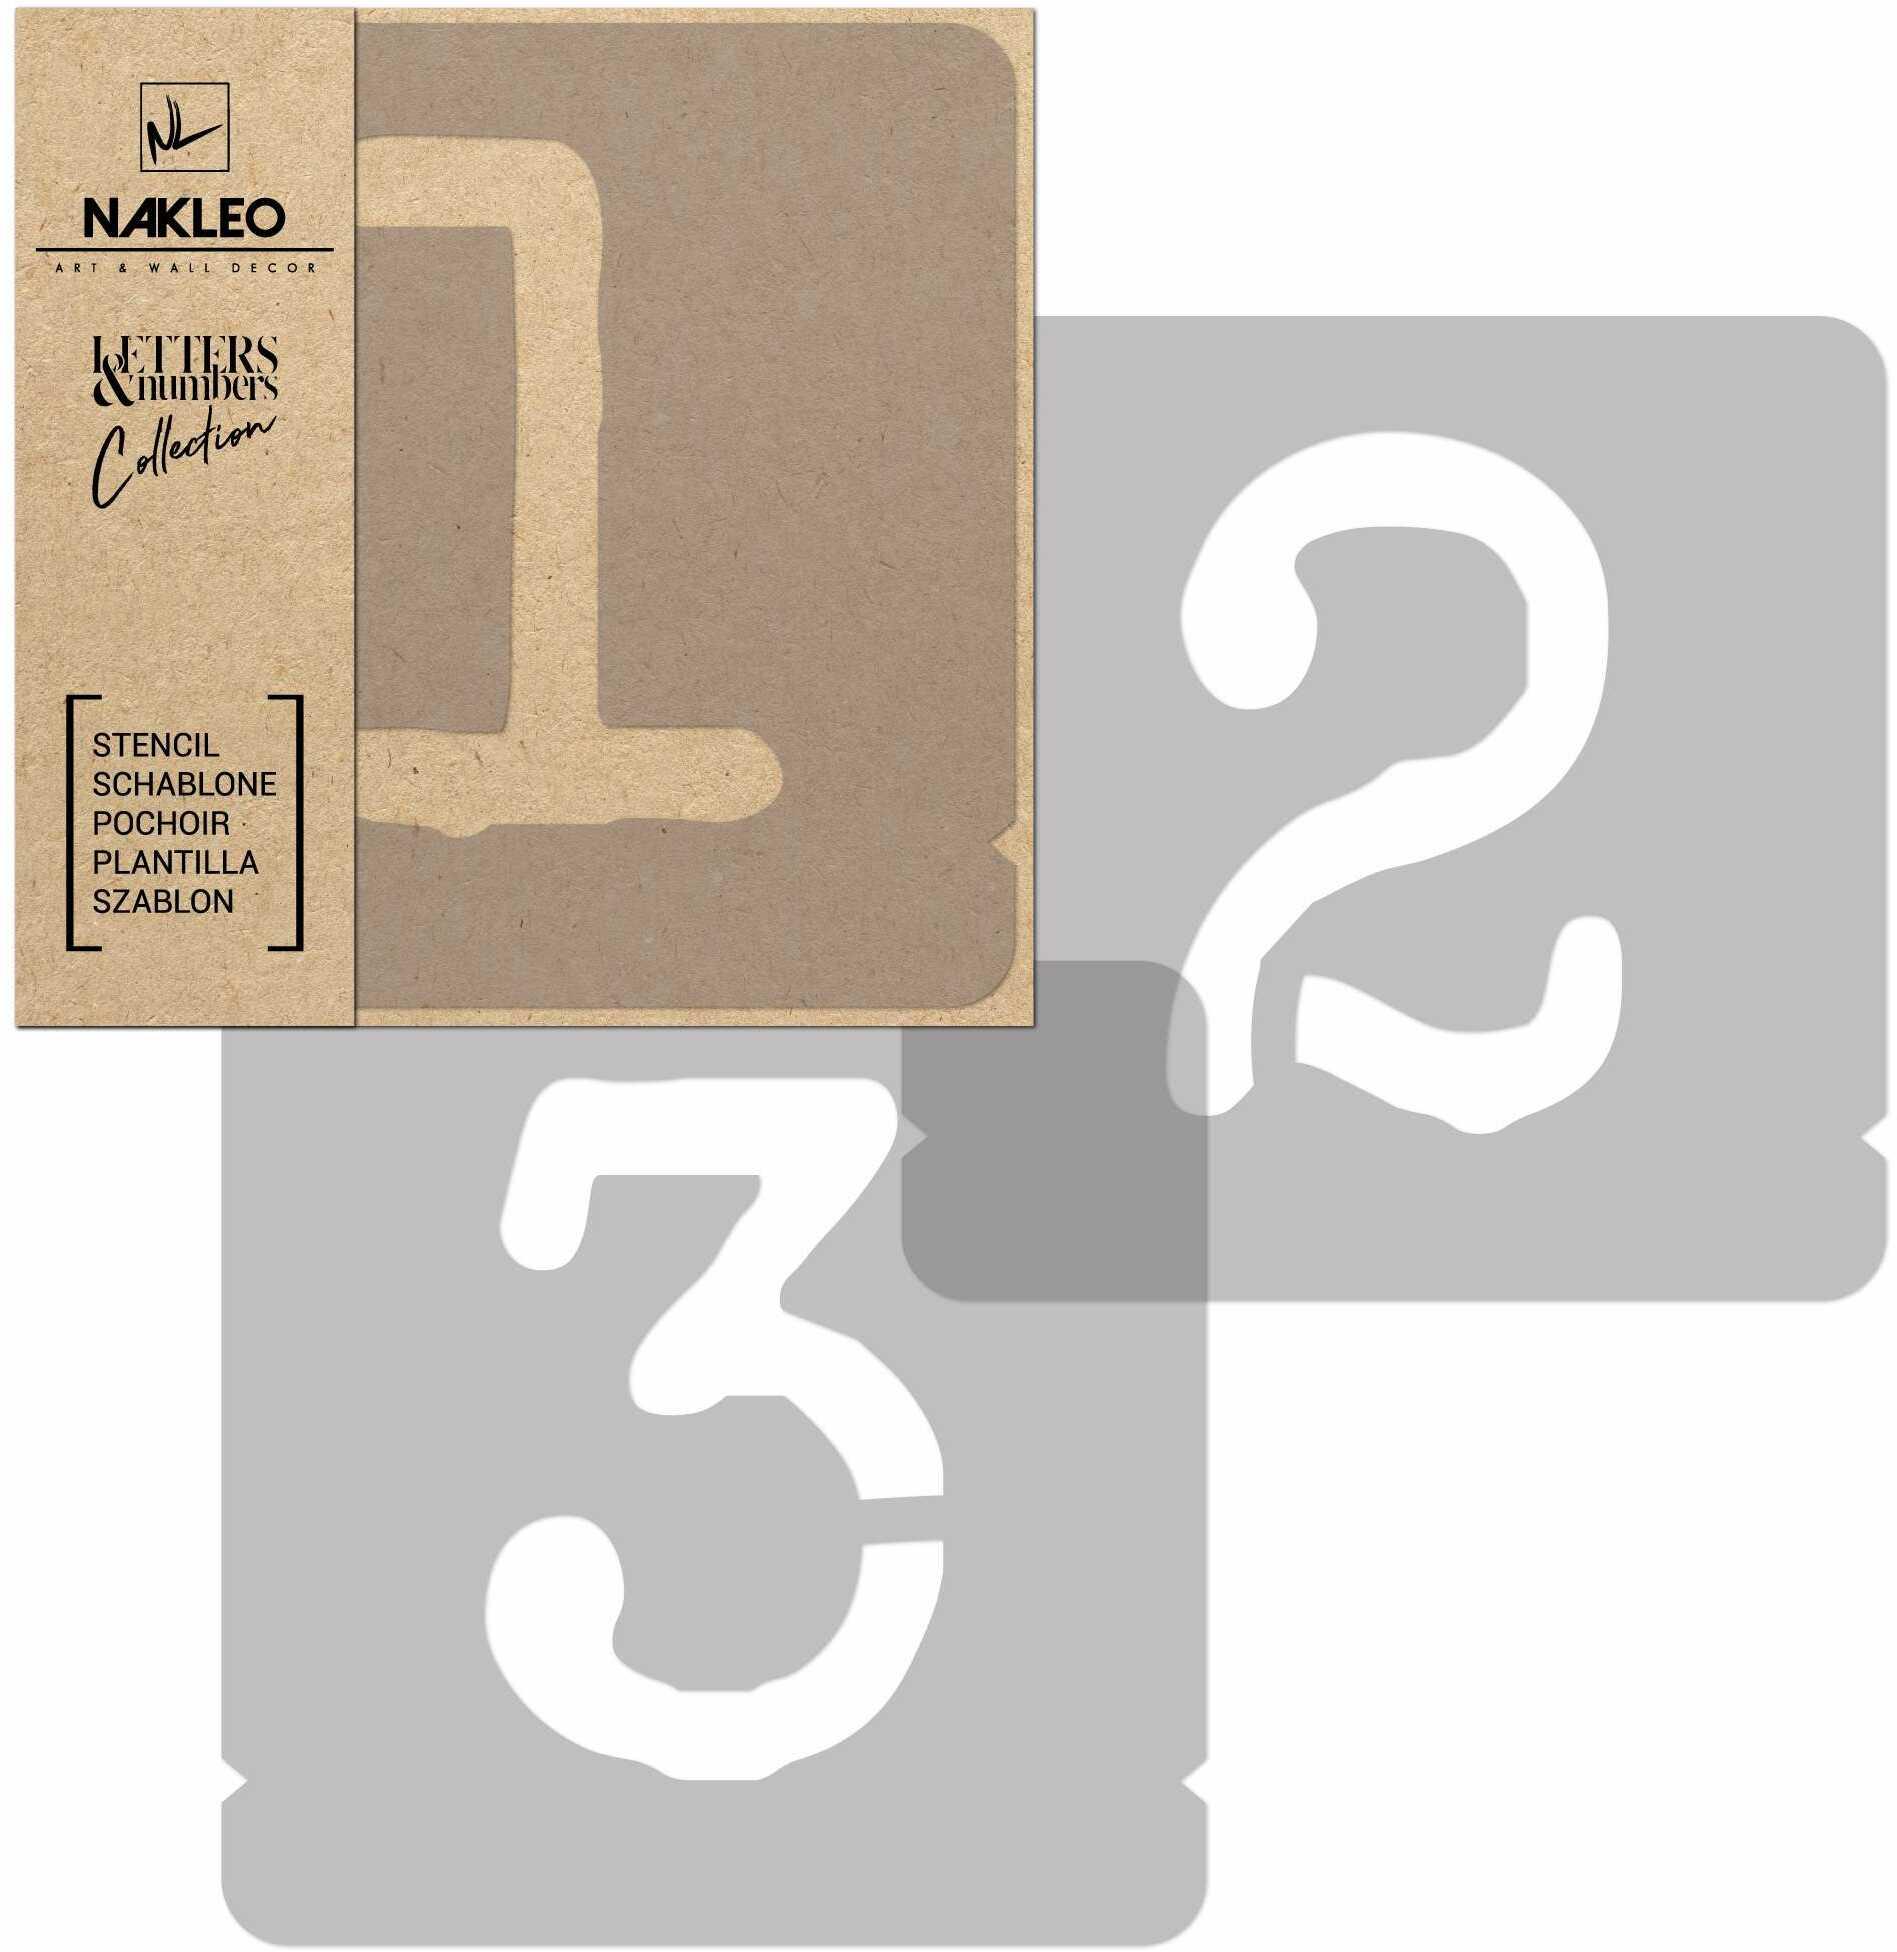 szablon malarski wielokrotny // cyfry 70 mm // Typewriter Cyfry